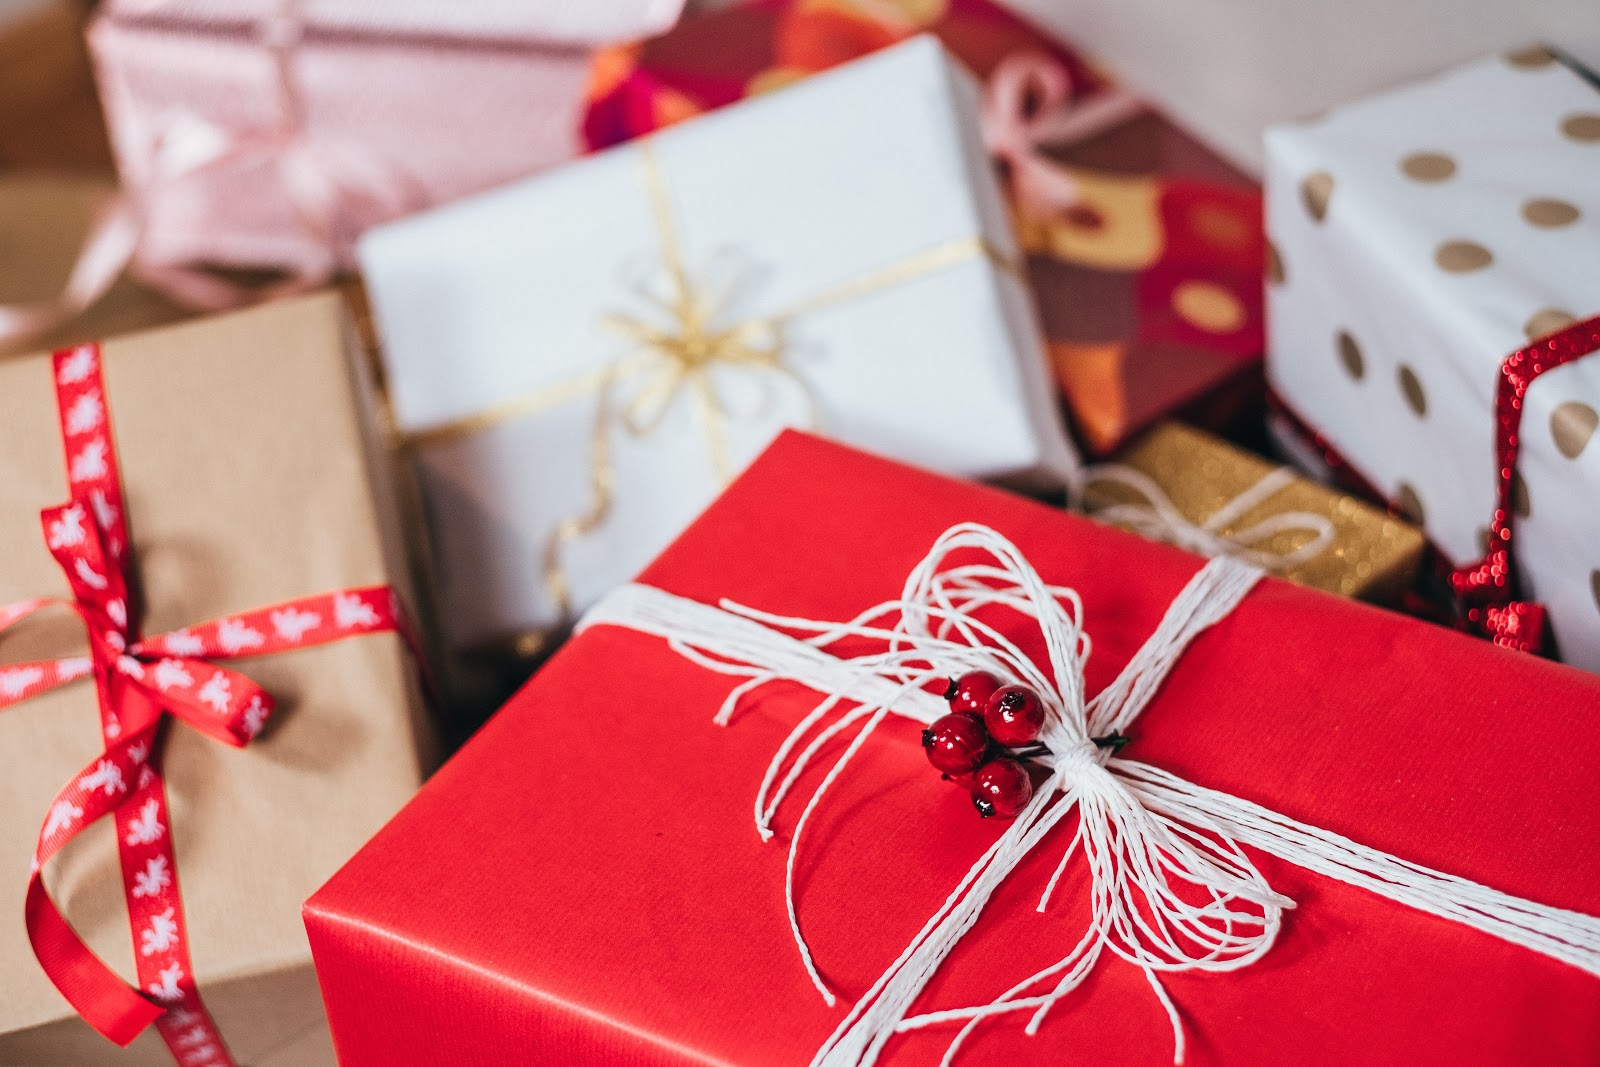 printingnews-A028-01 paperbox好文分享-季節性包裝指南